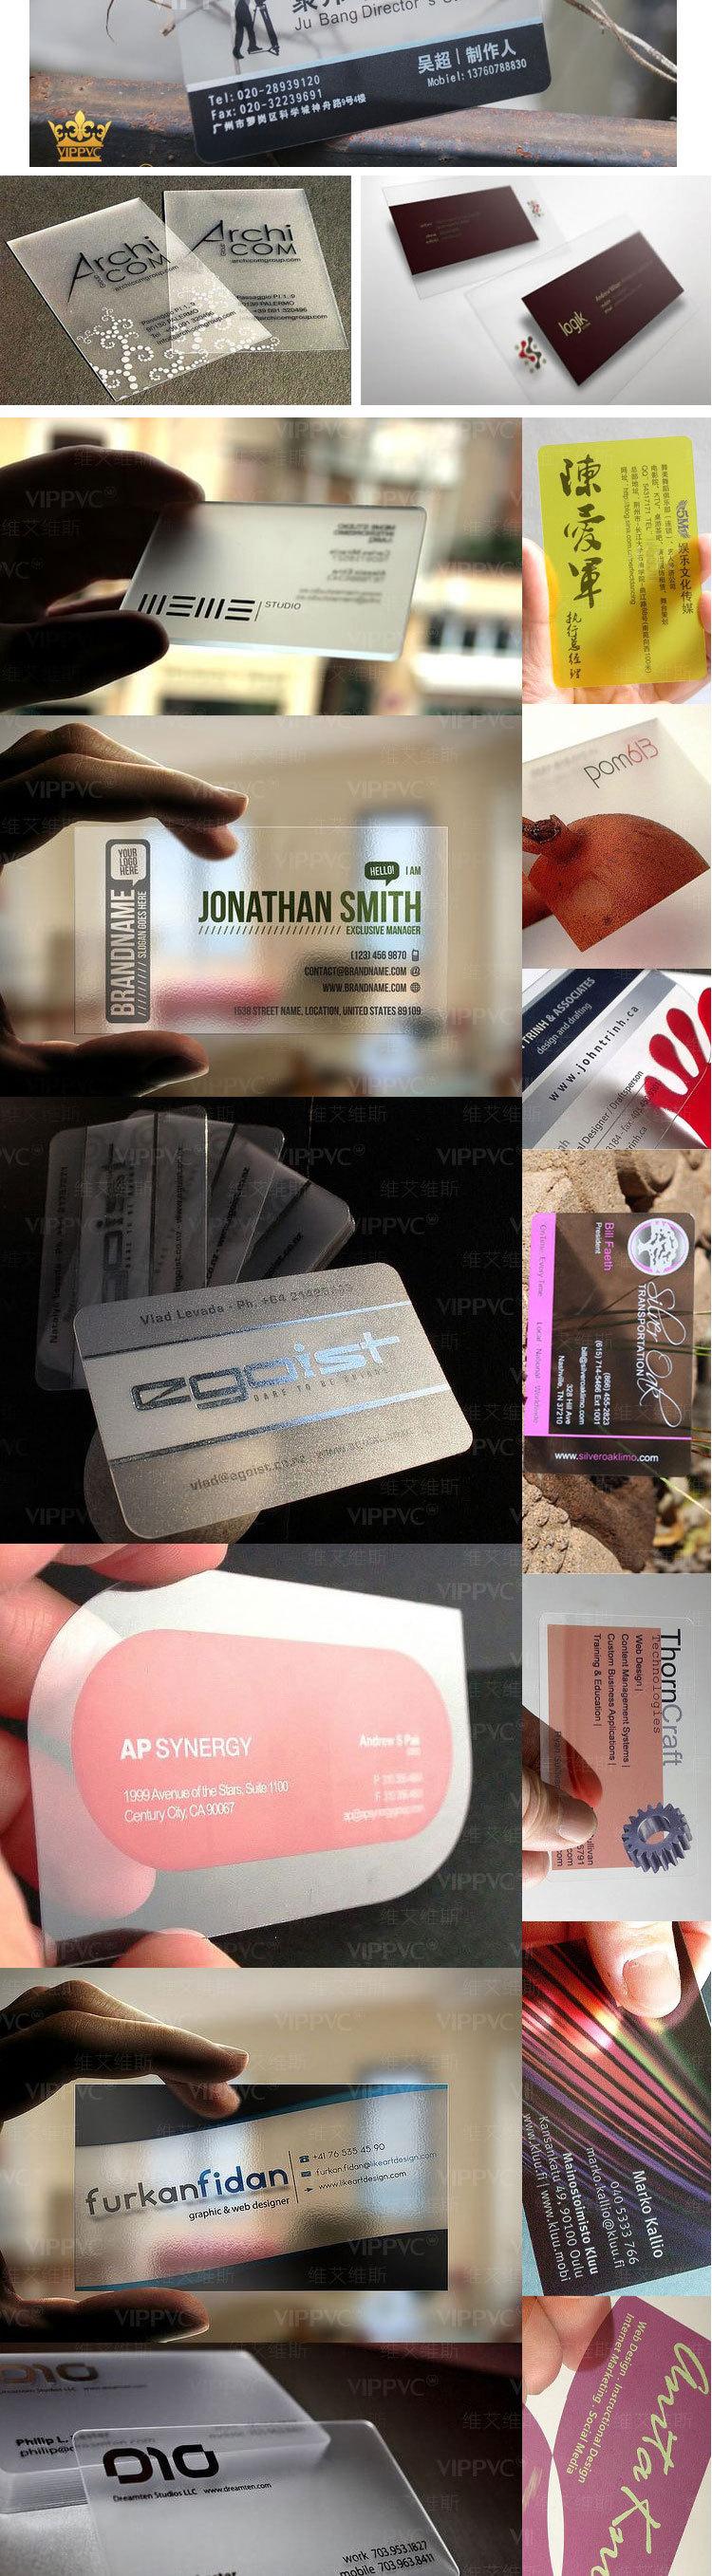 Pvc Transparent Card,Thick Plastic Business Cards - Buy Pvc ...